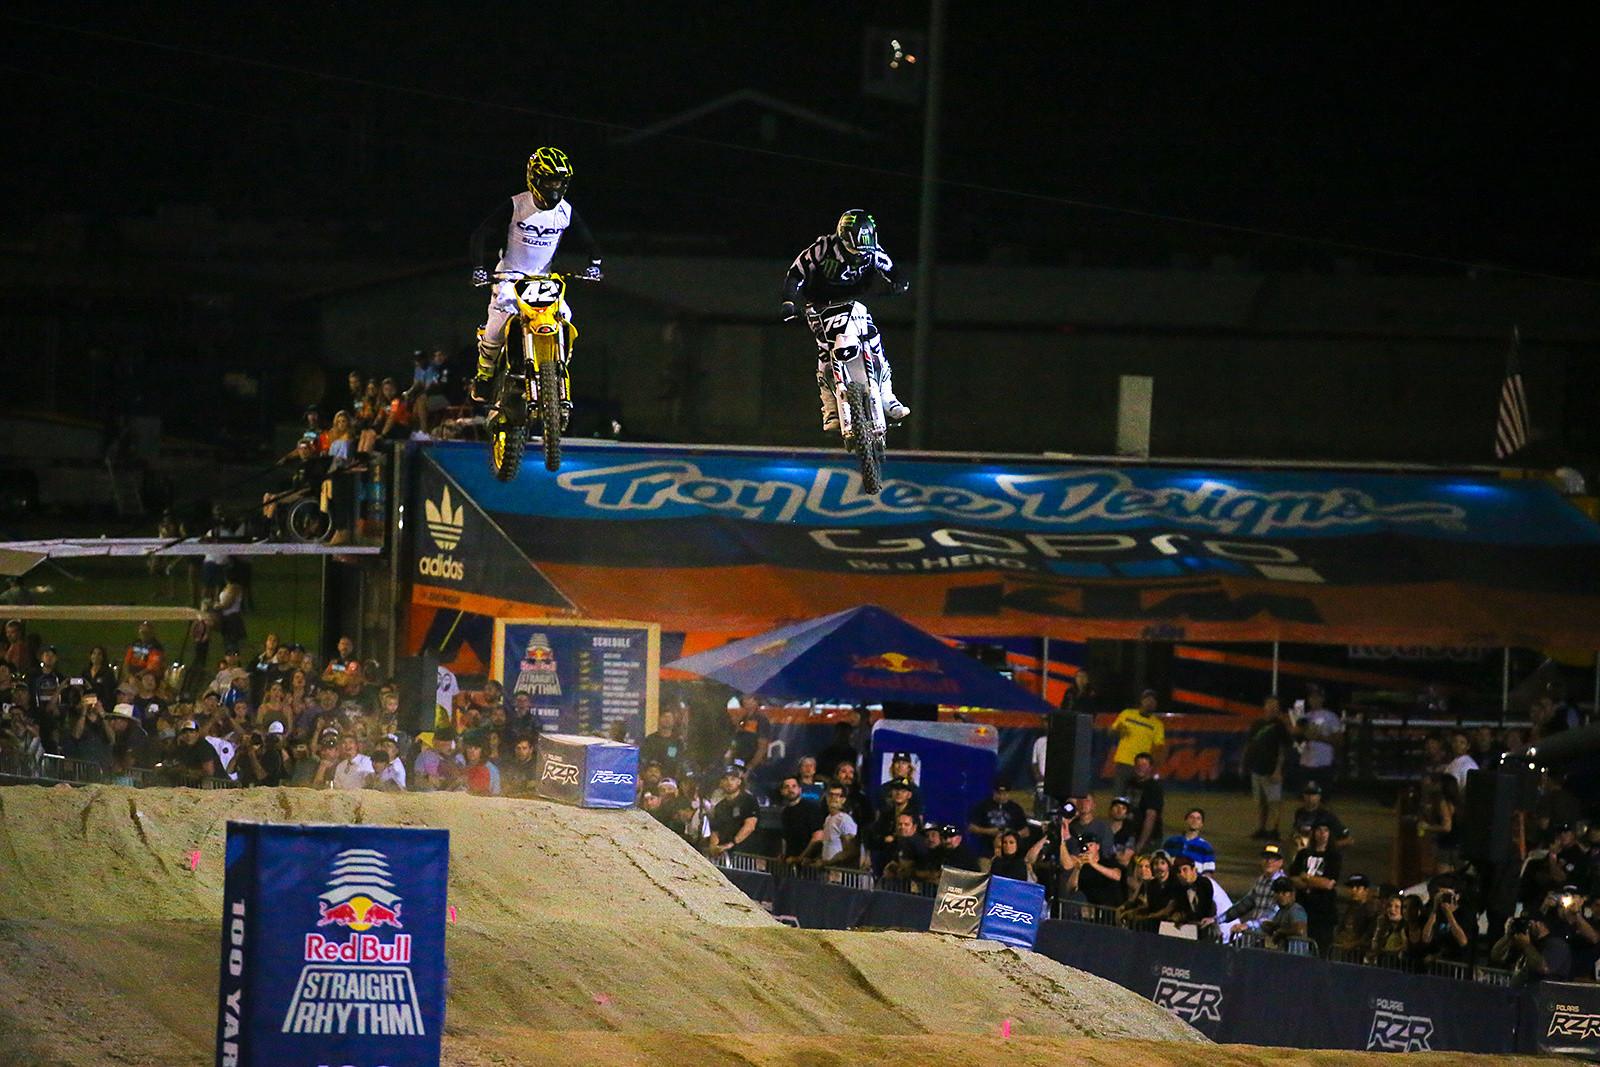 Kyle Cunningham and Josh Hill - Photo Blast: Red Bull Straight Rhythm - Motocross Pictures - Vital MX